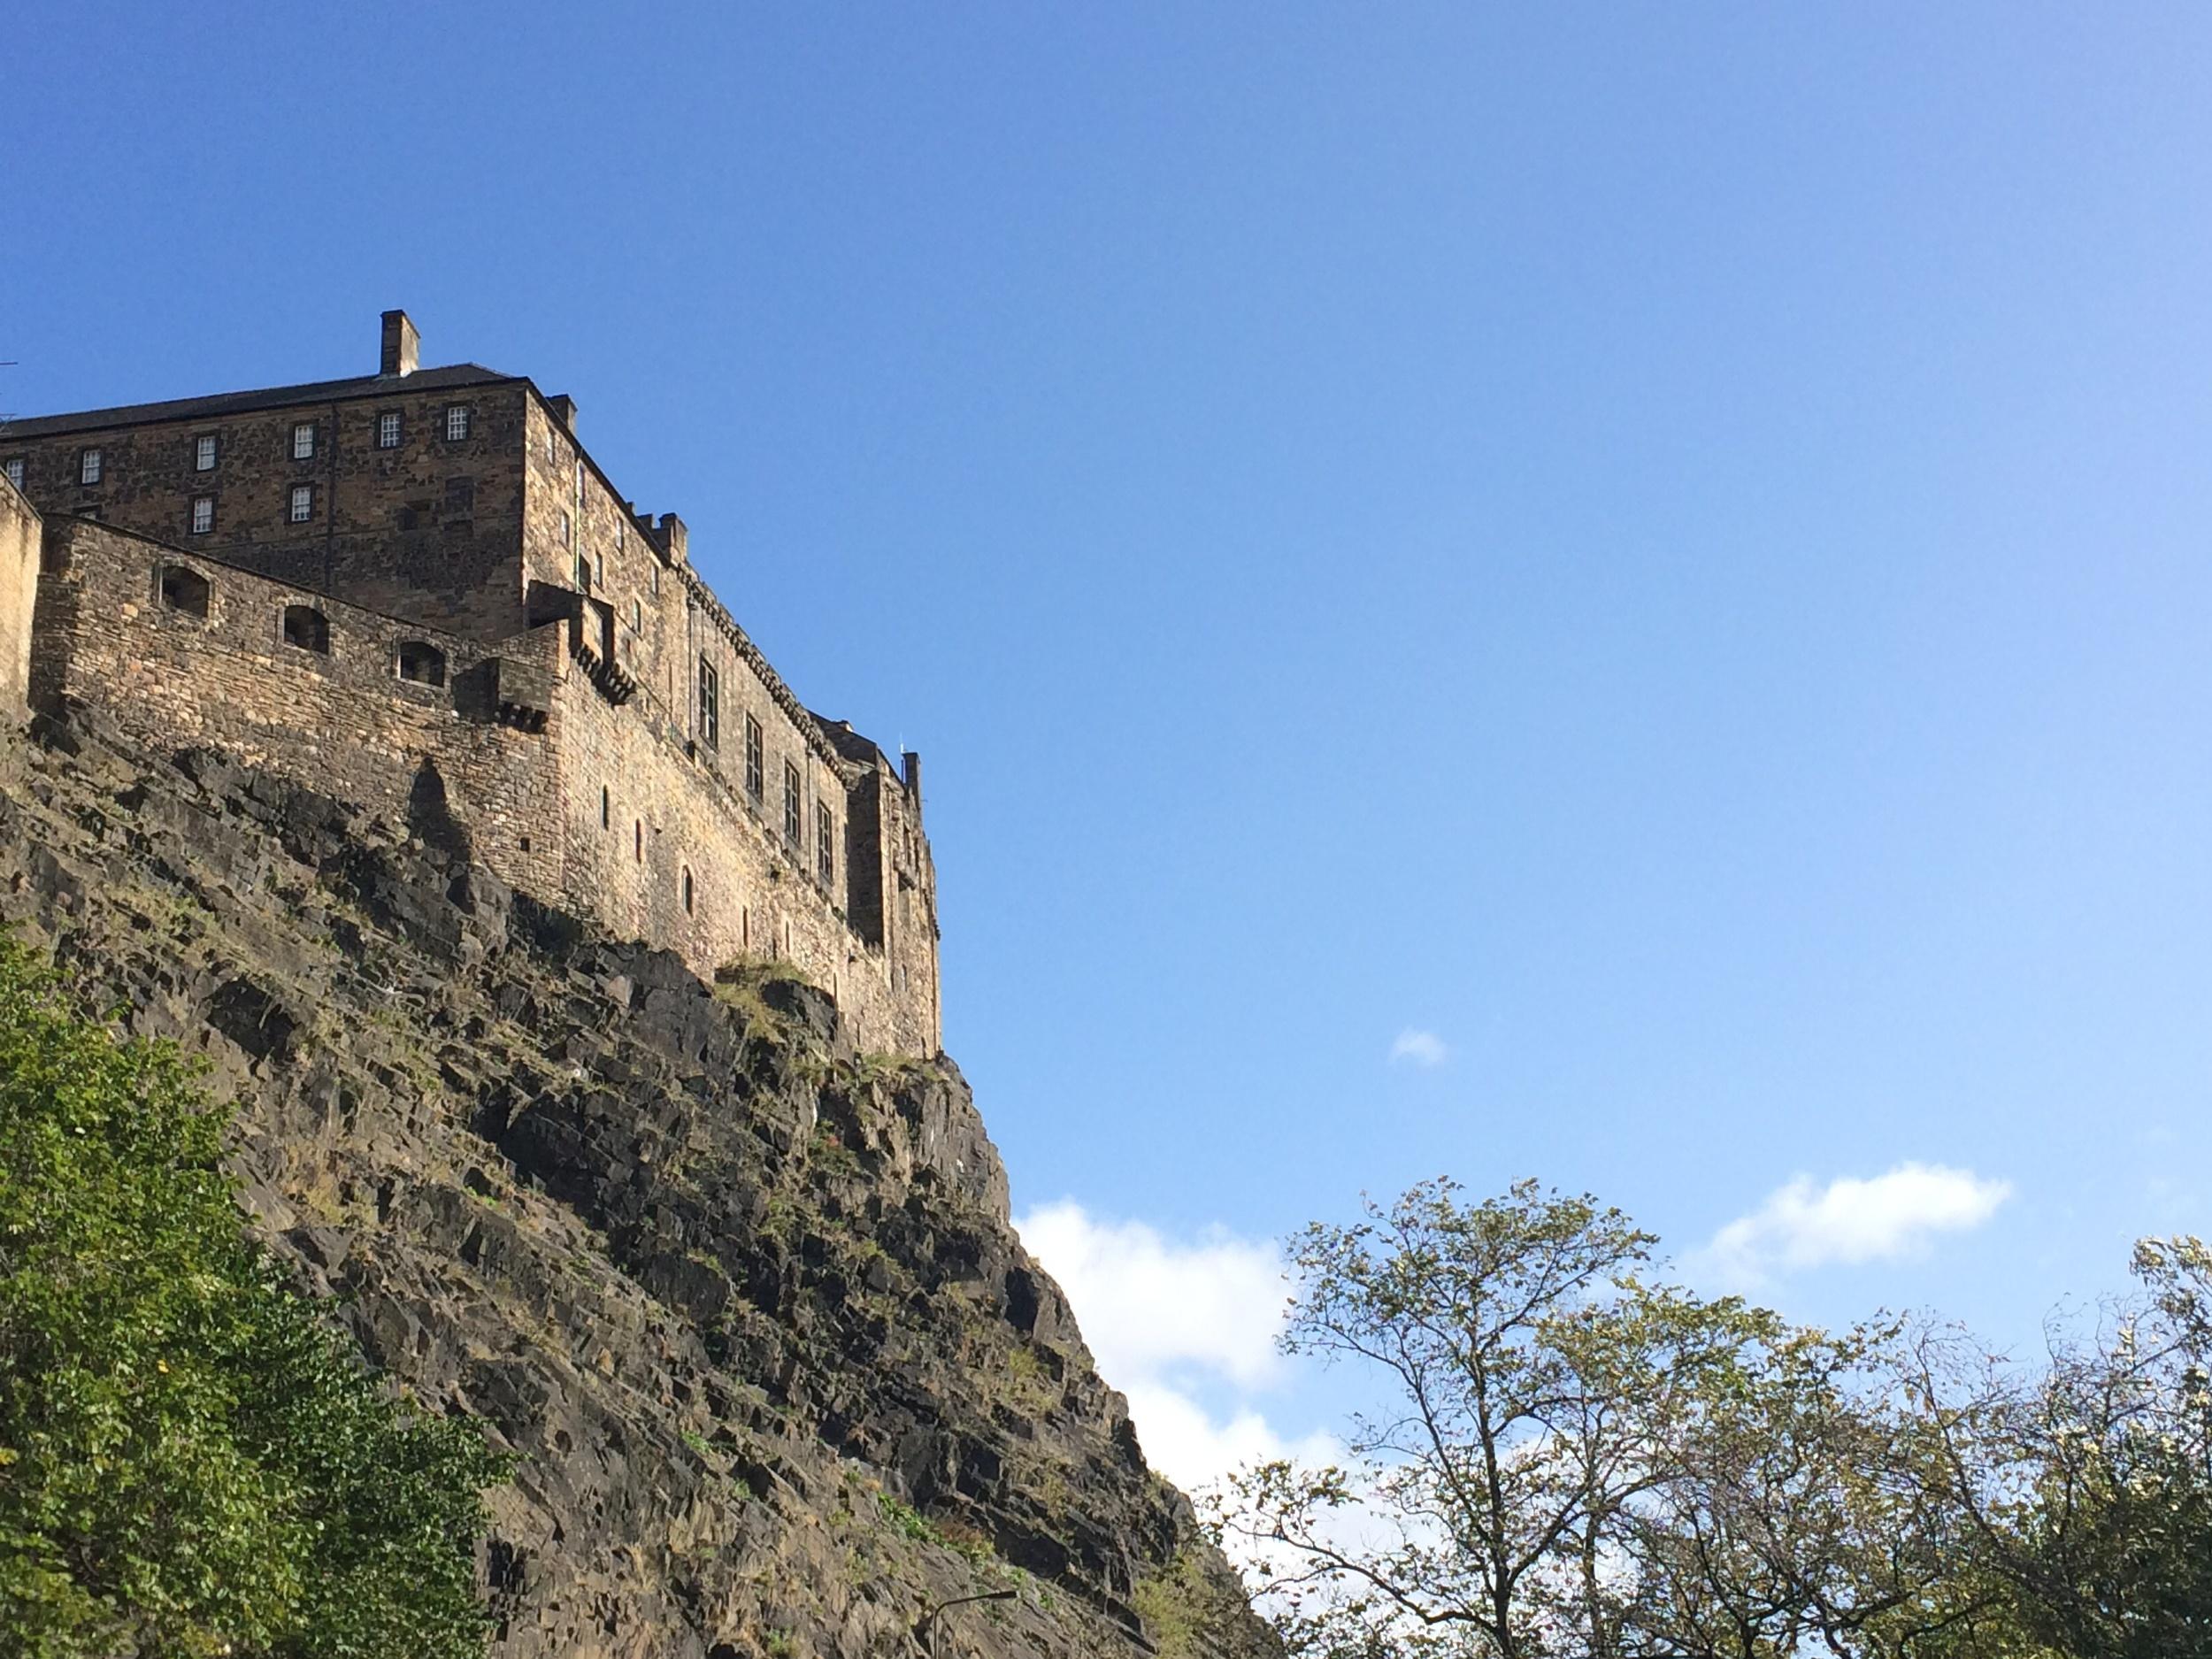 Efinburgh Castle